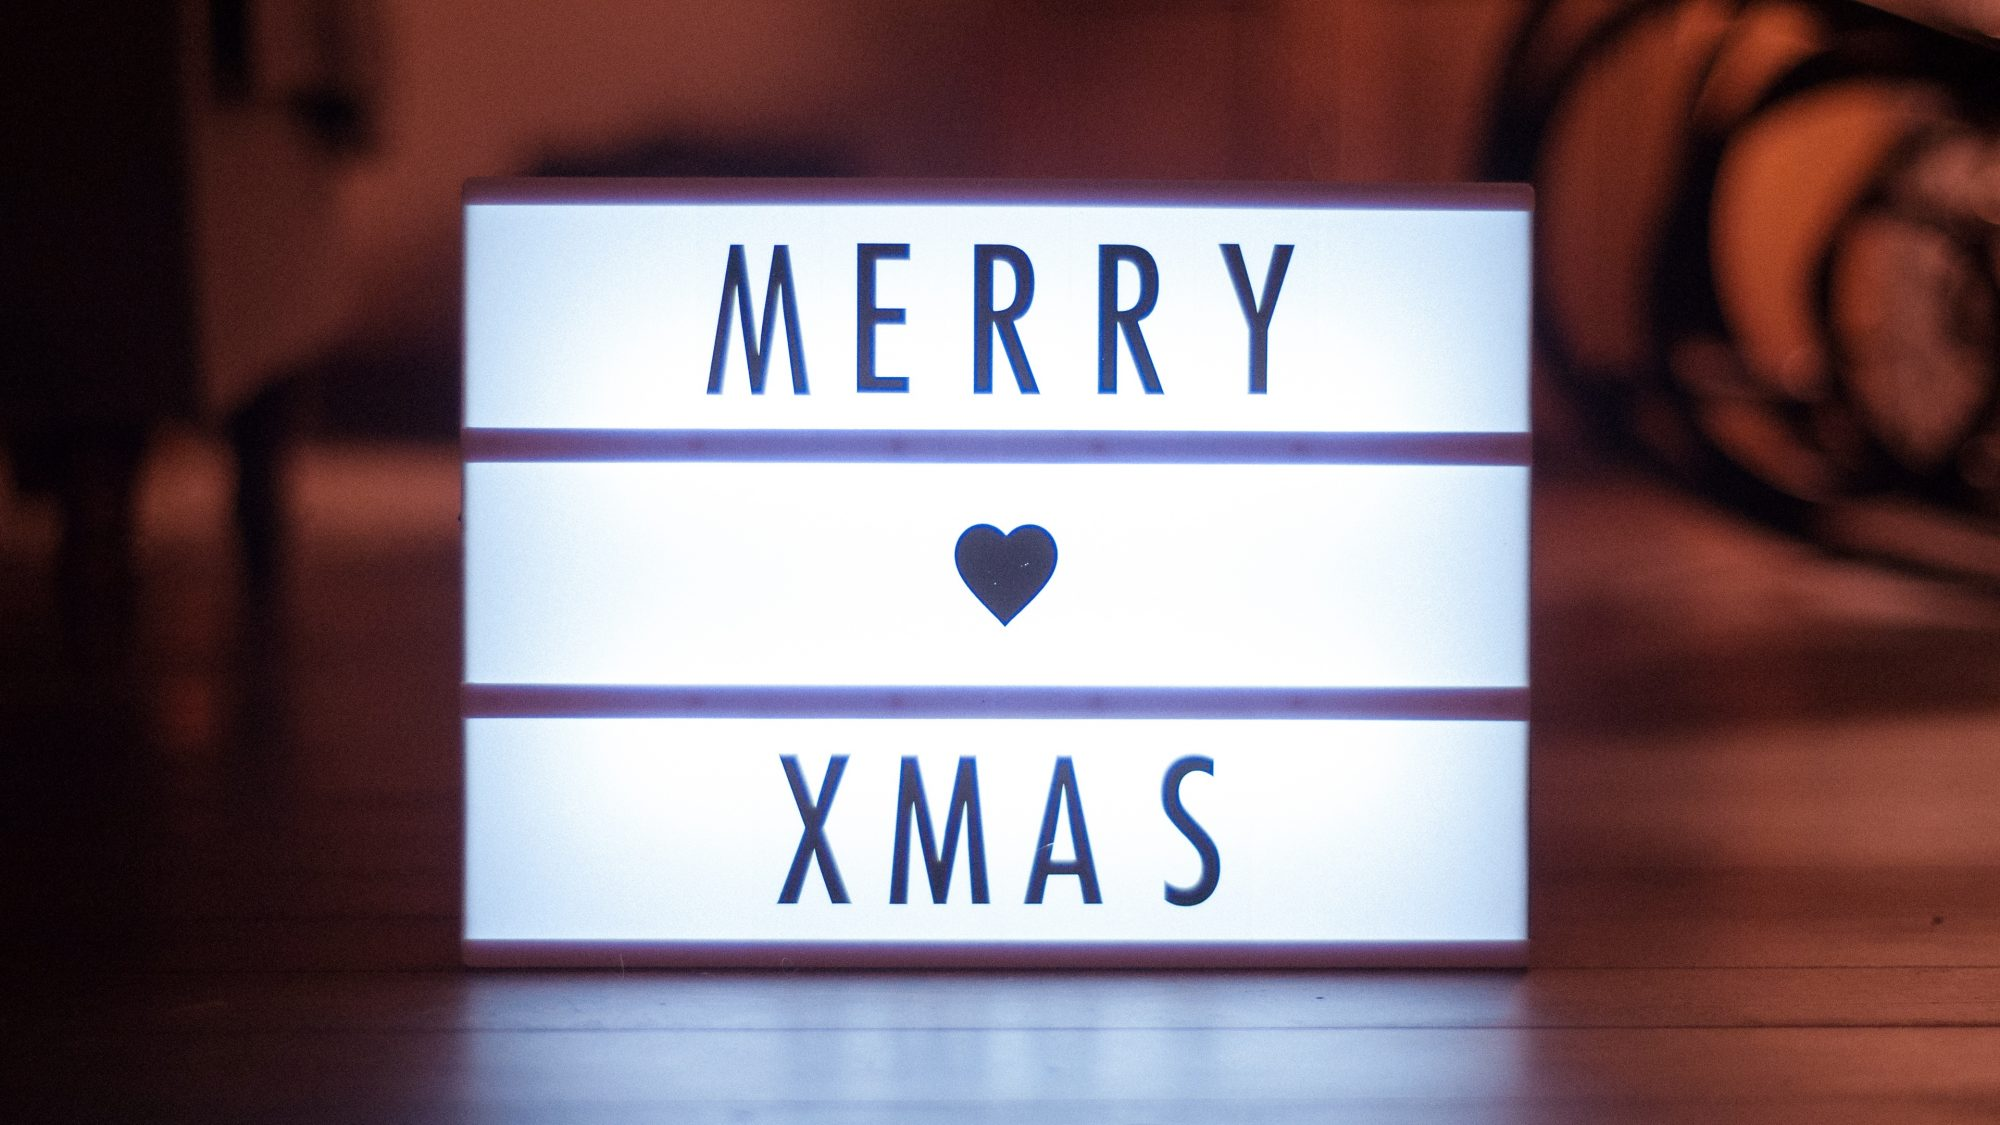 merry xmas light box